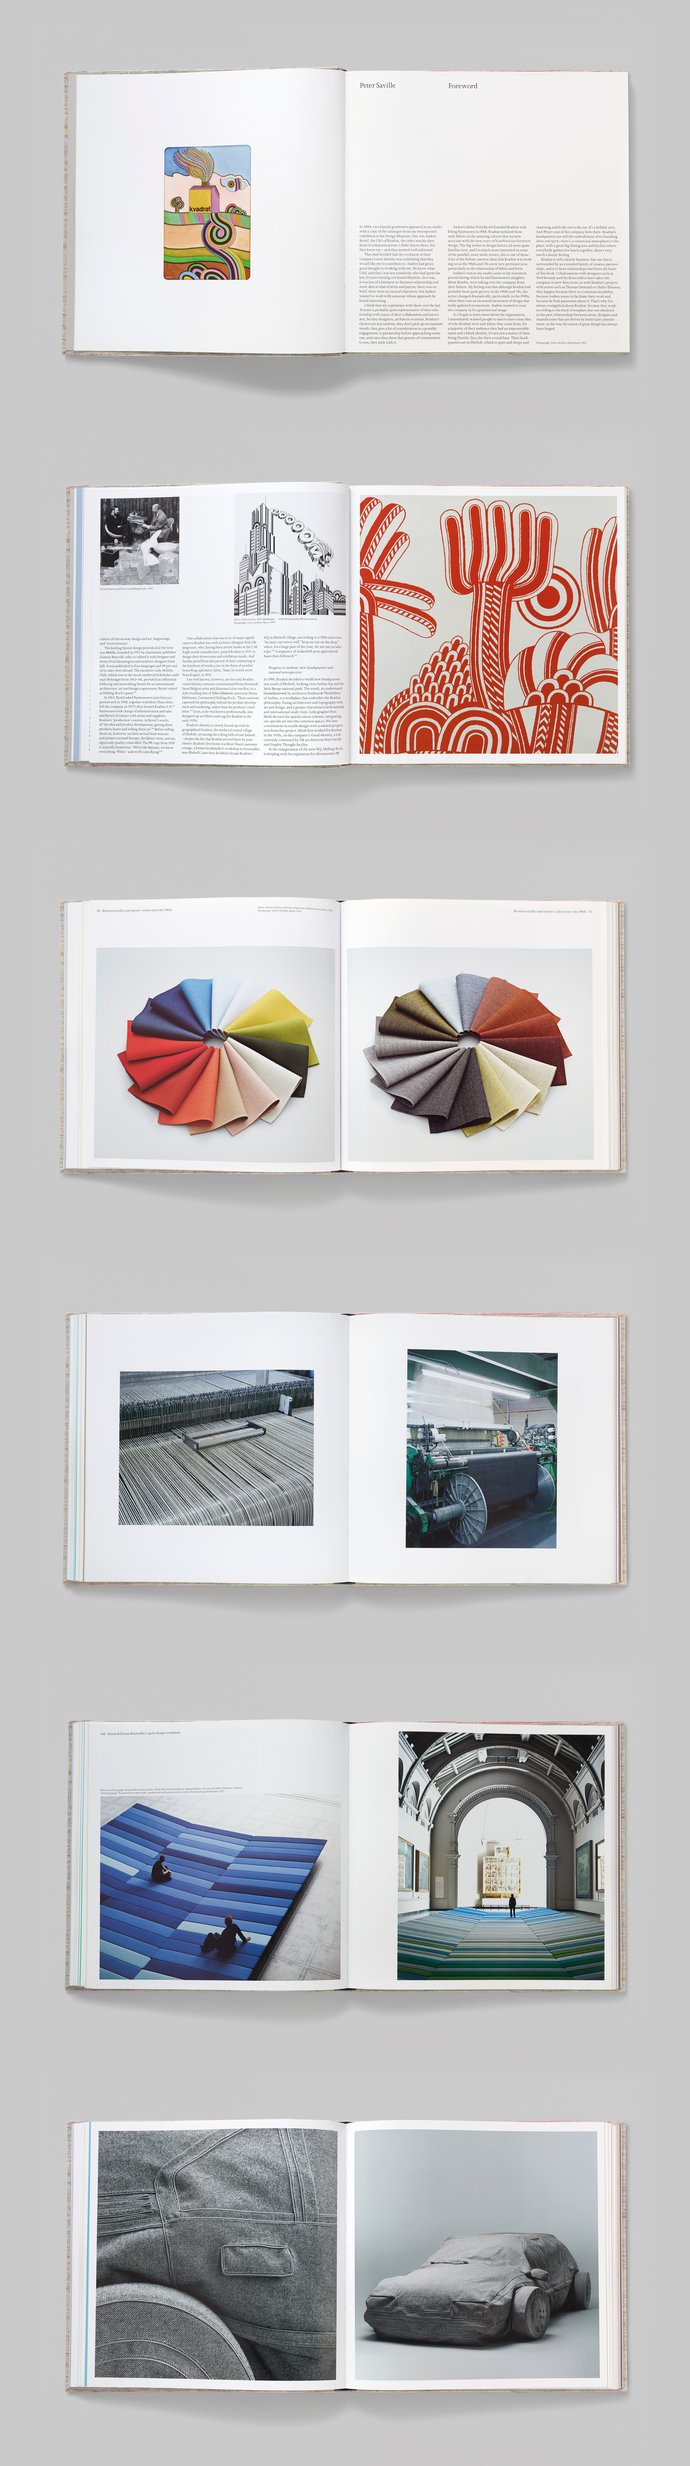 Kvadrat – Interwoven: Kvadrat textile and design, 2014 (Publication), image 4